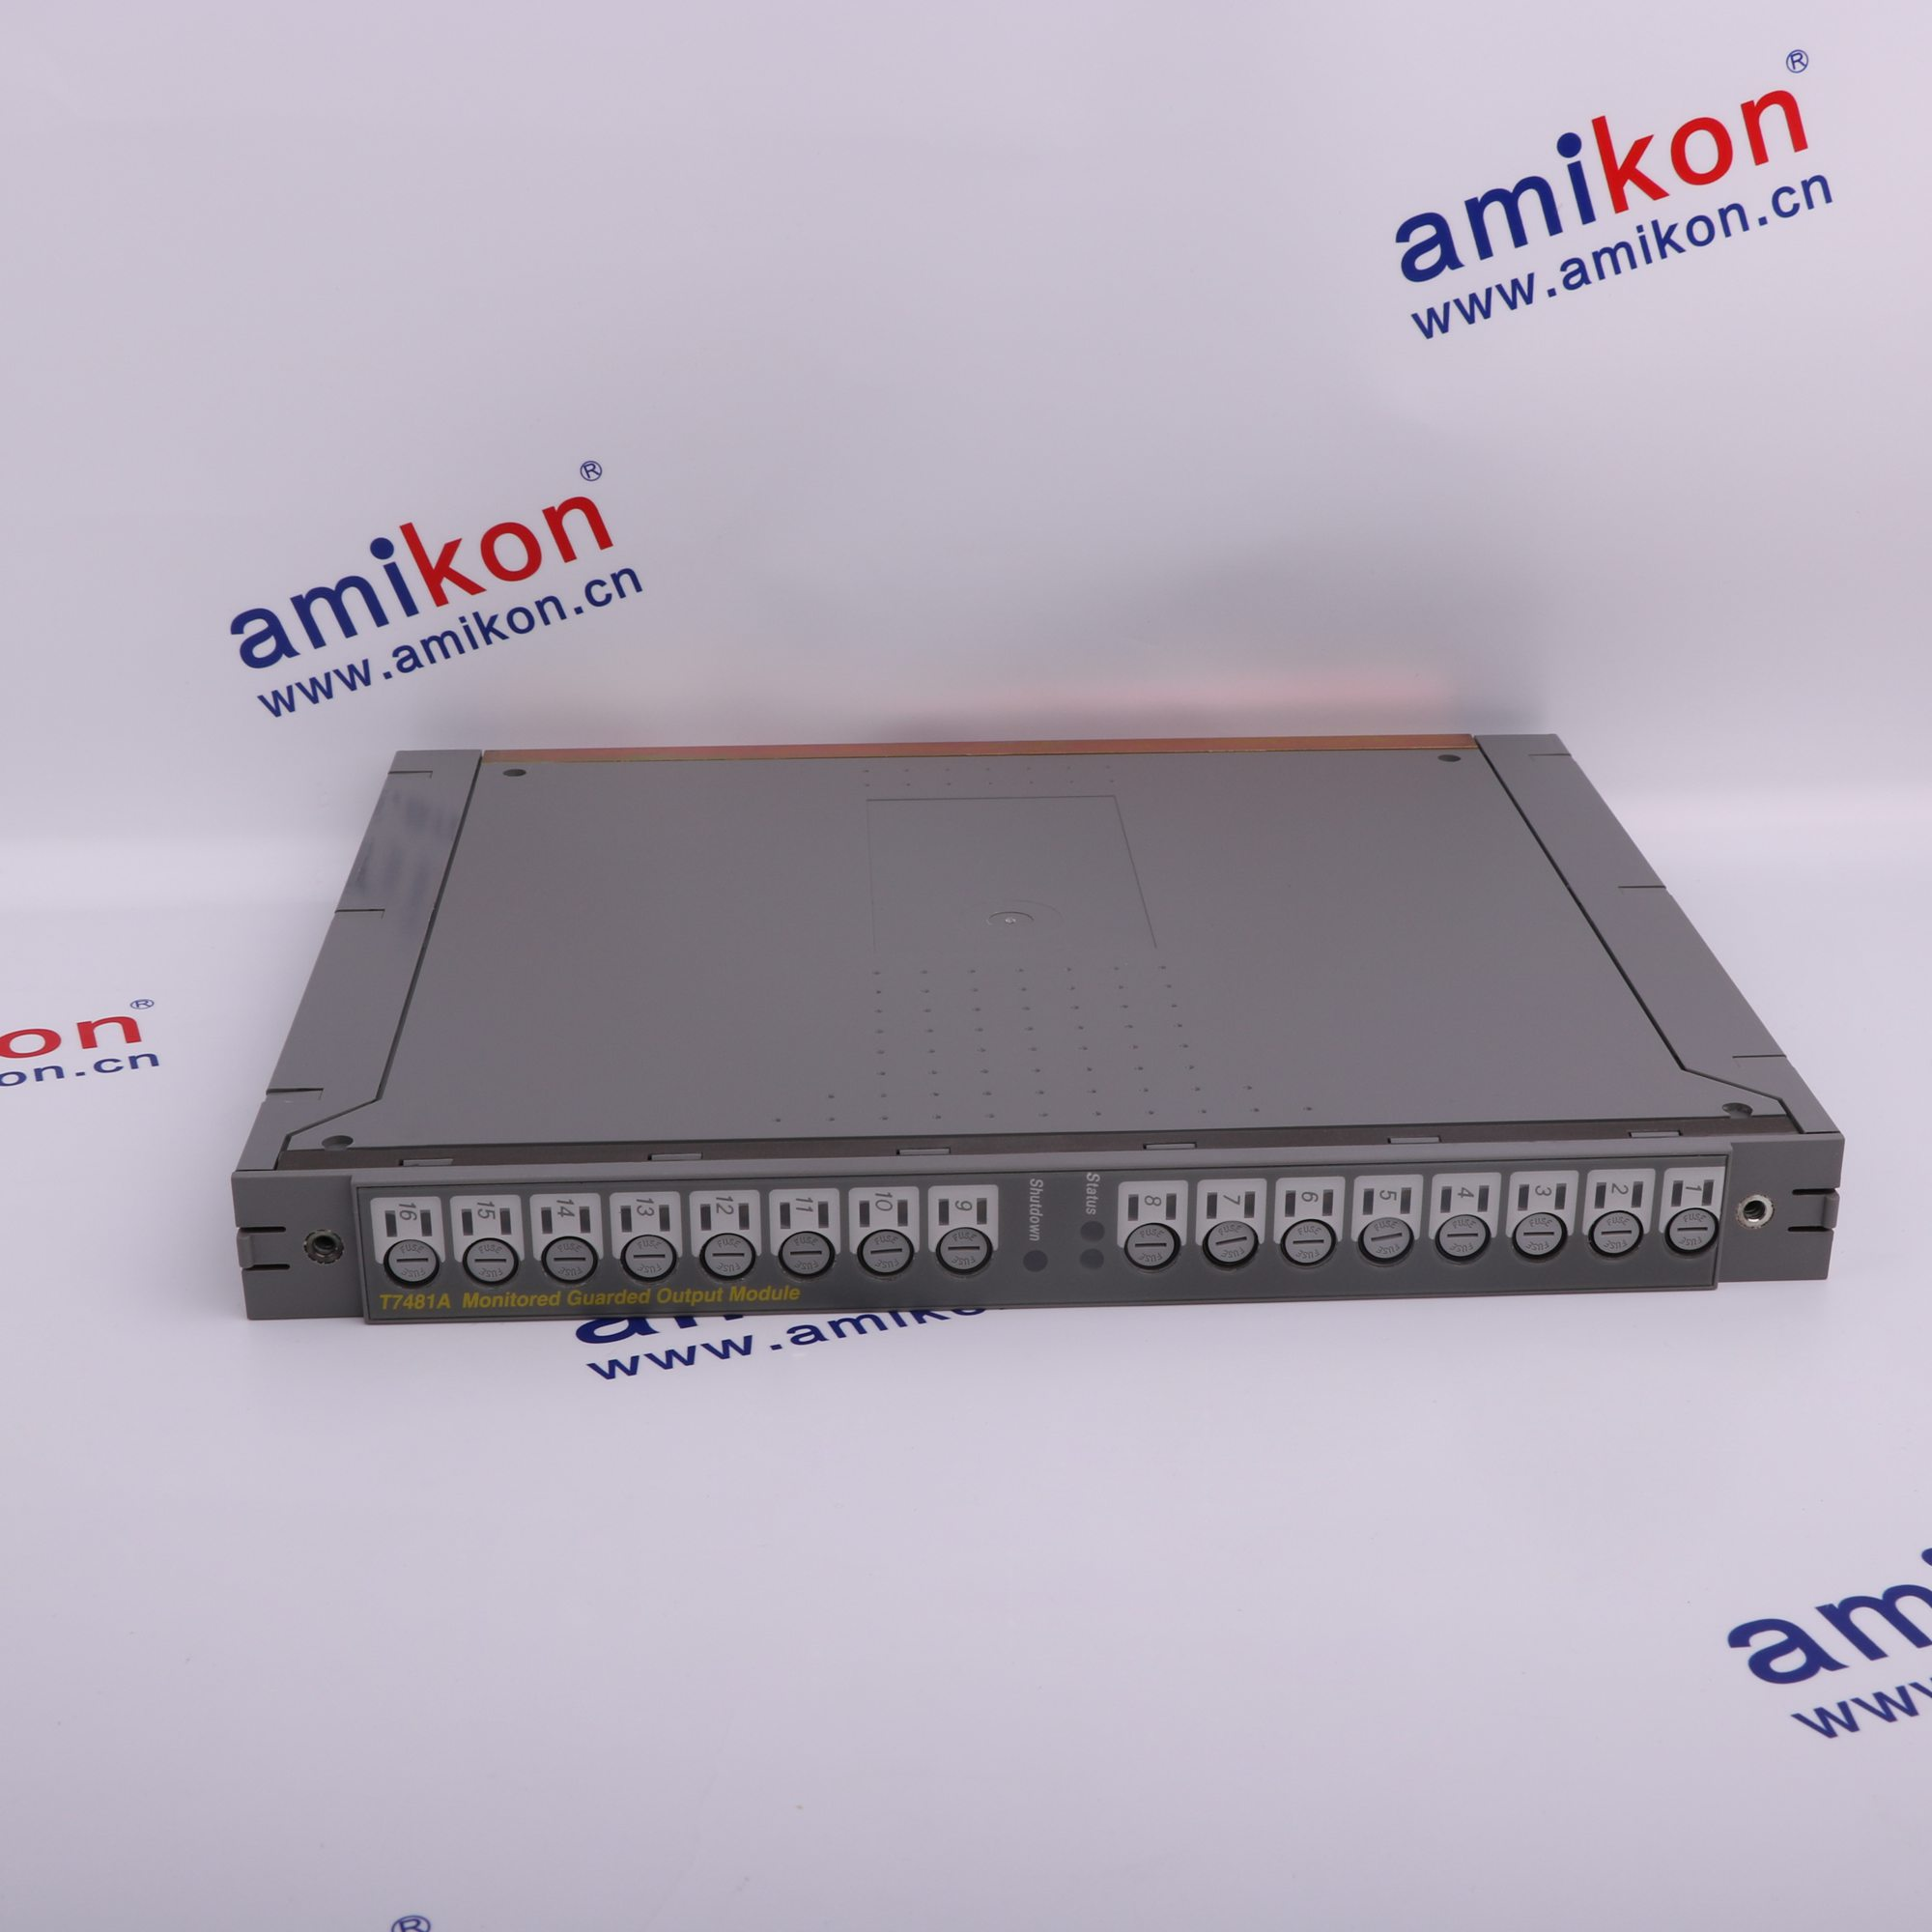 T8431 Trusted TMR Analogue Input Module